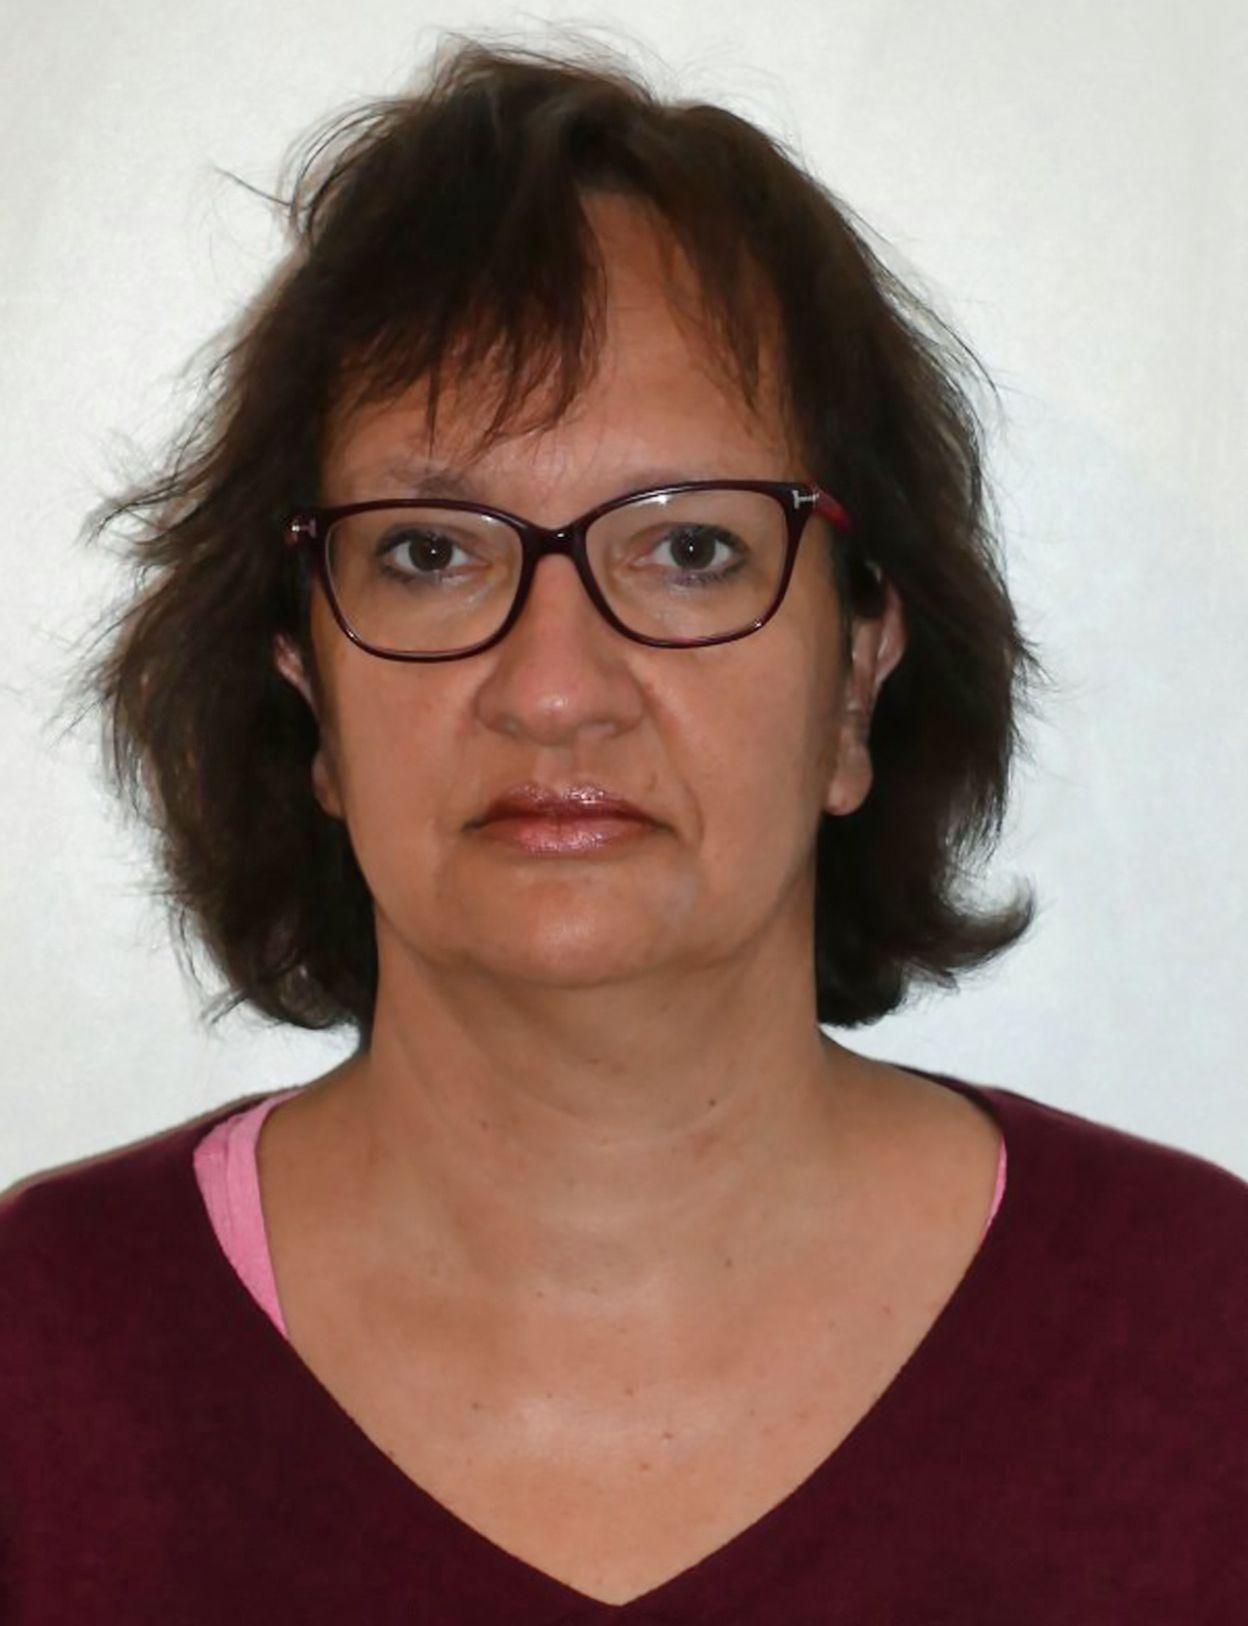 Angela Wanke-Schopf